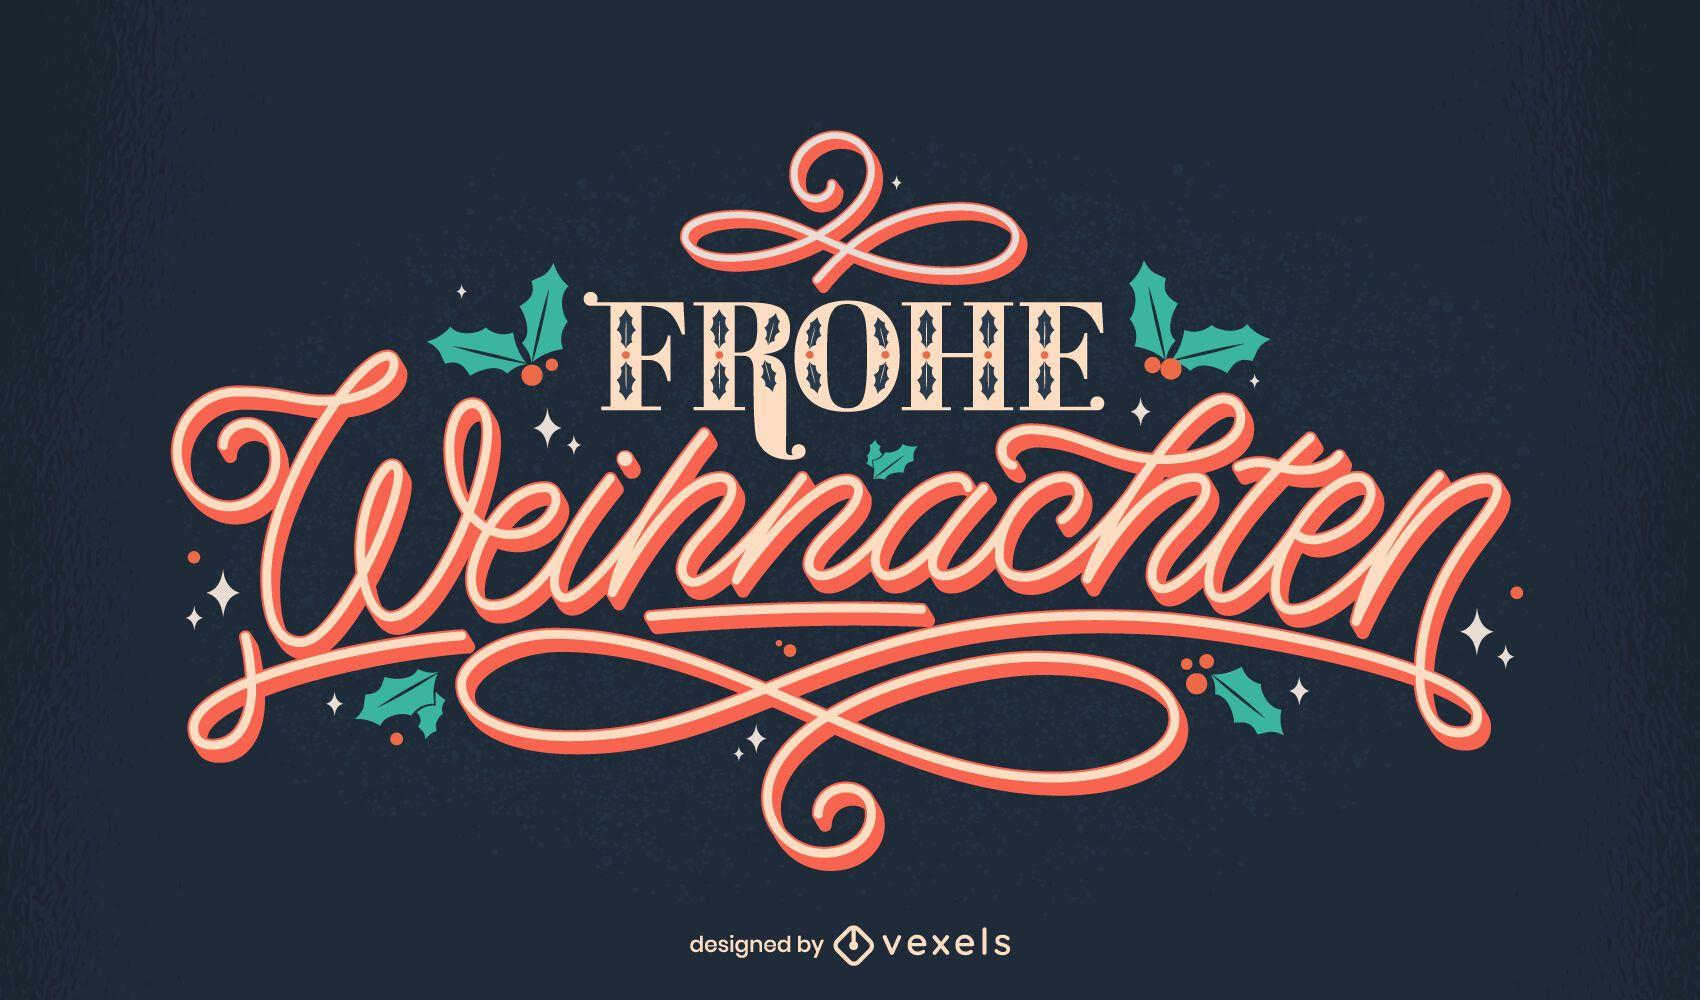 Merry Christmas german lettering design